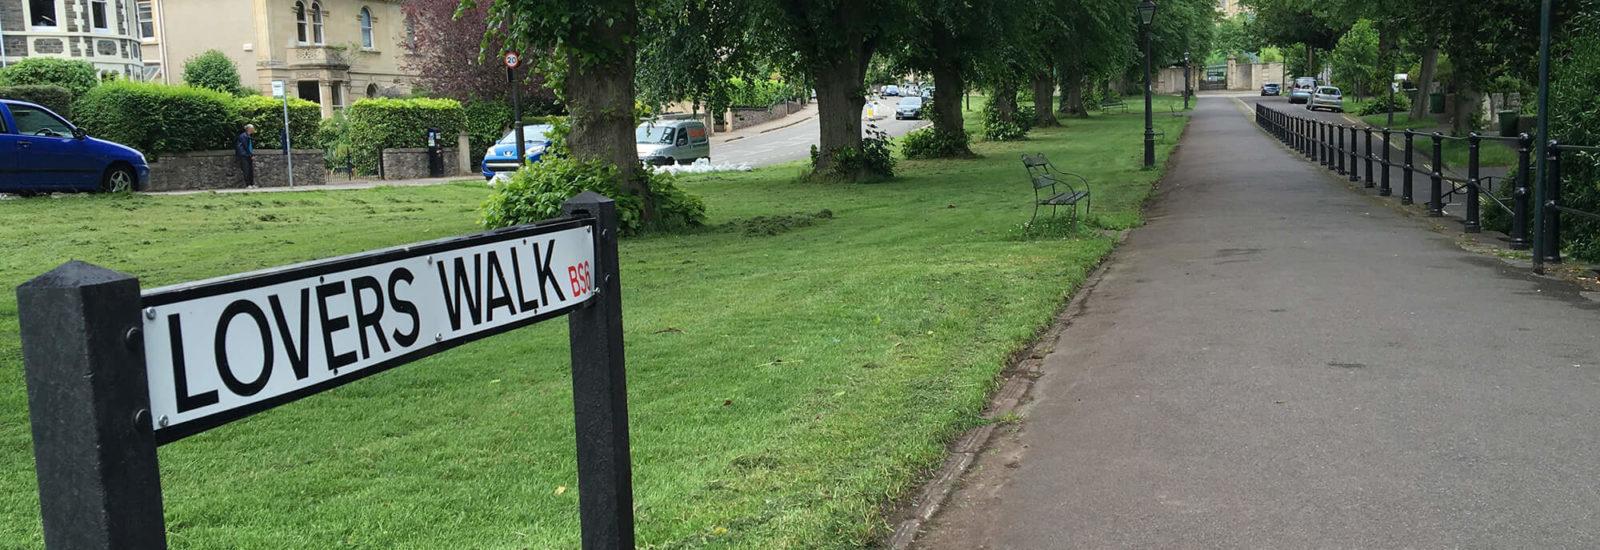 Image of Cotham Gardens & Lovers Walk